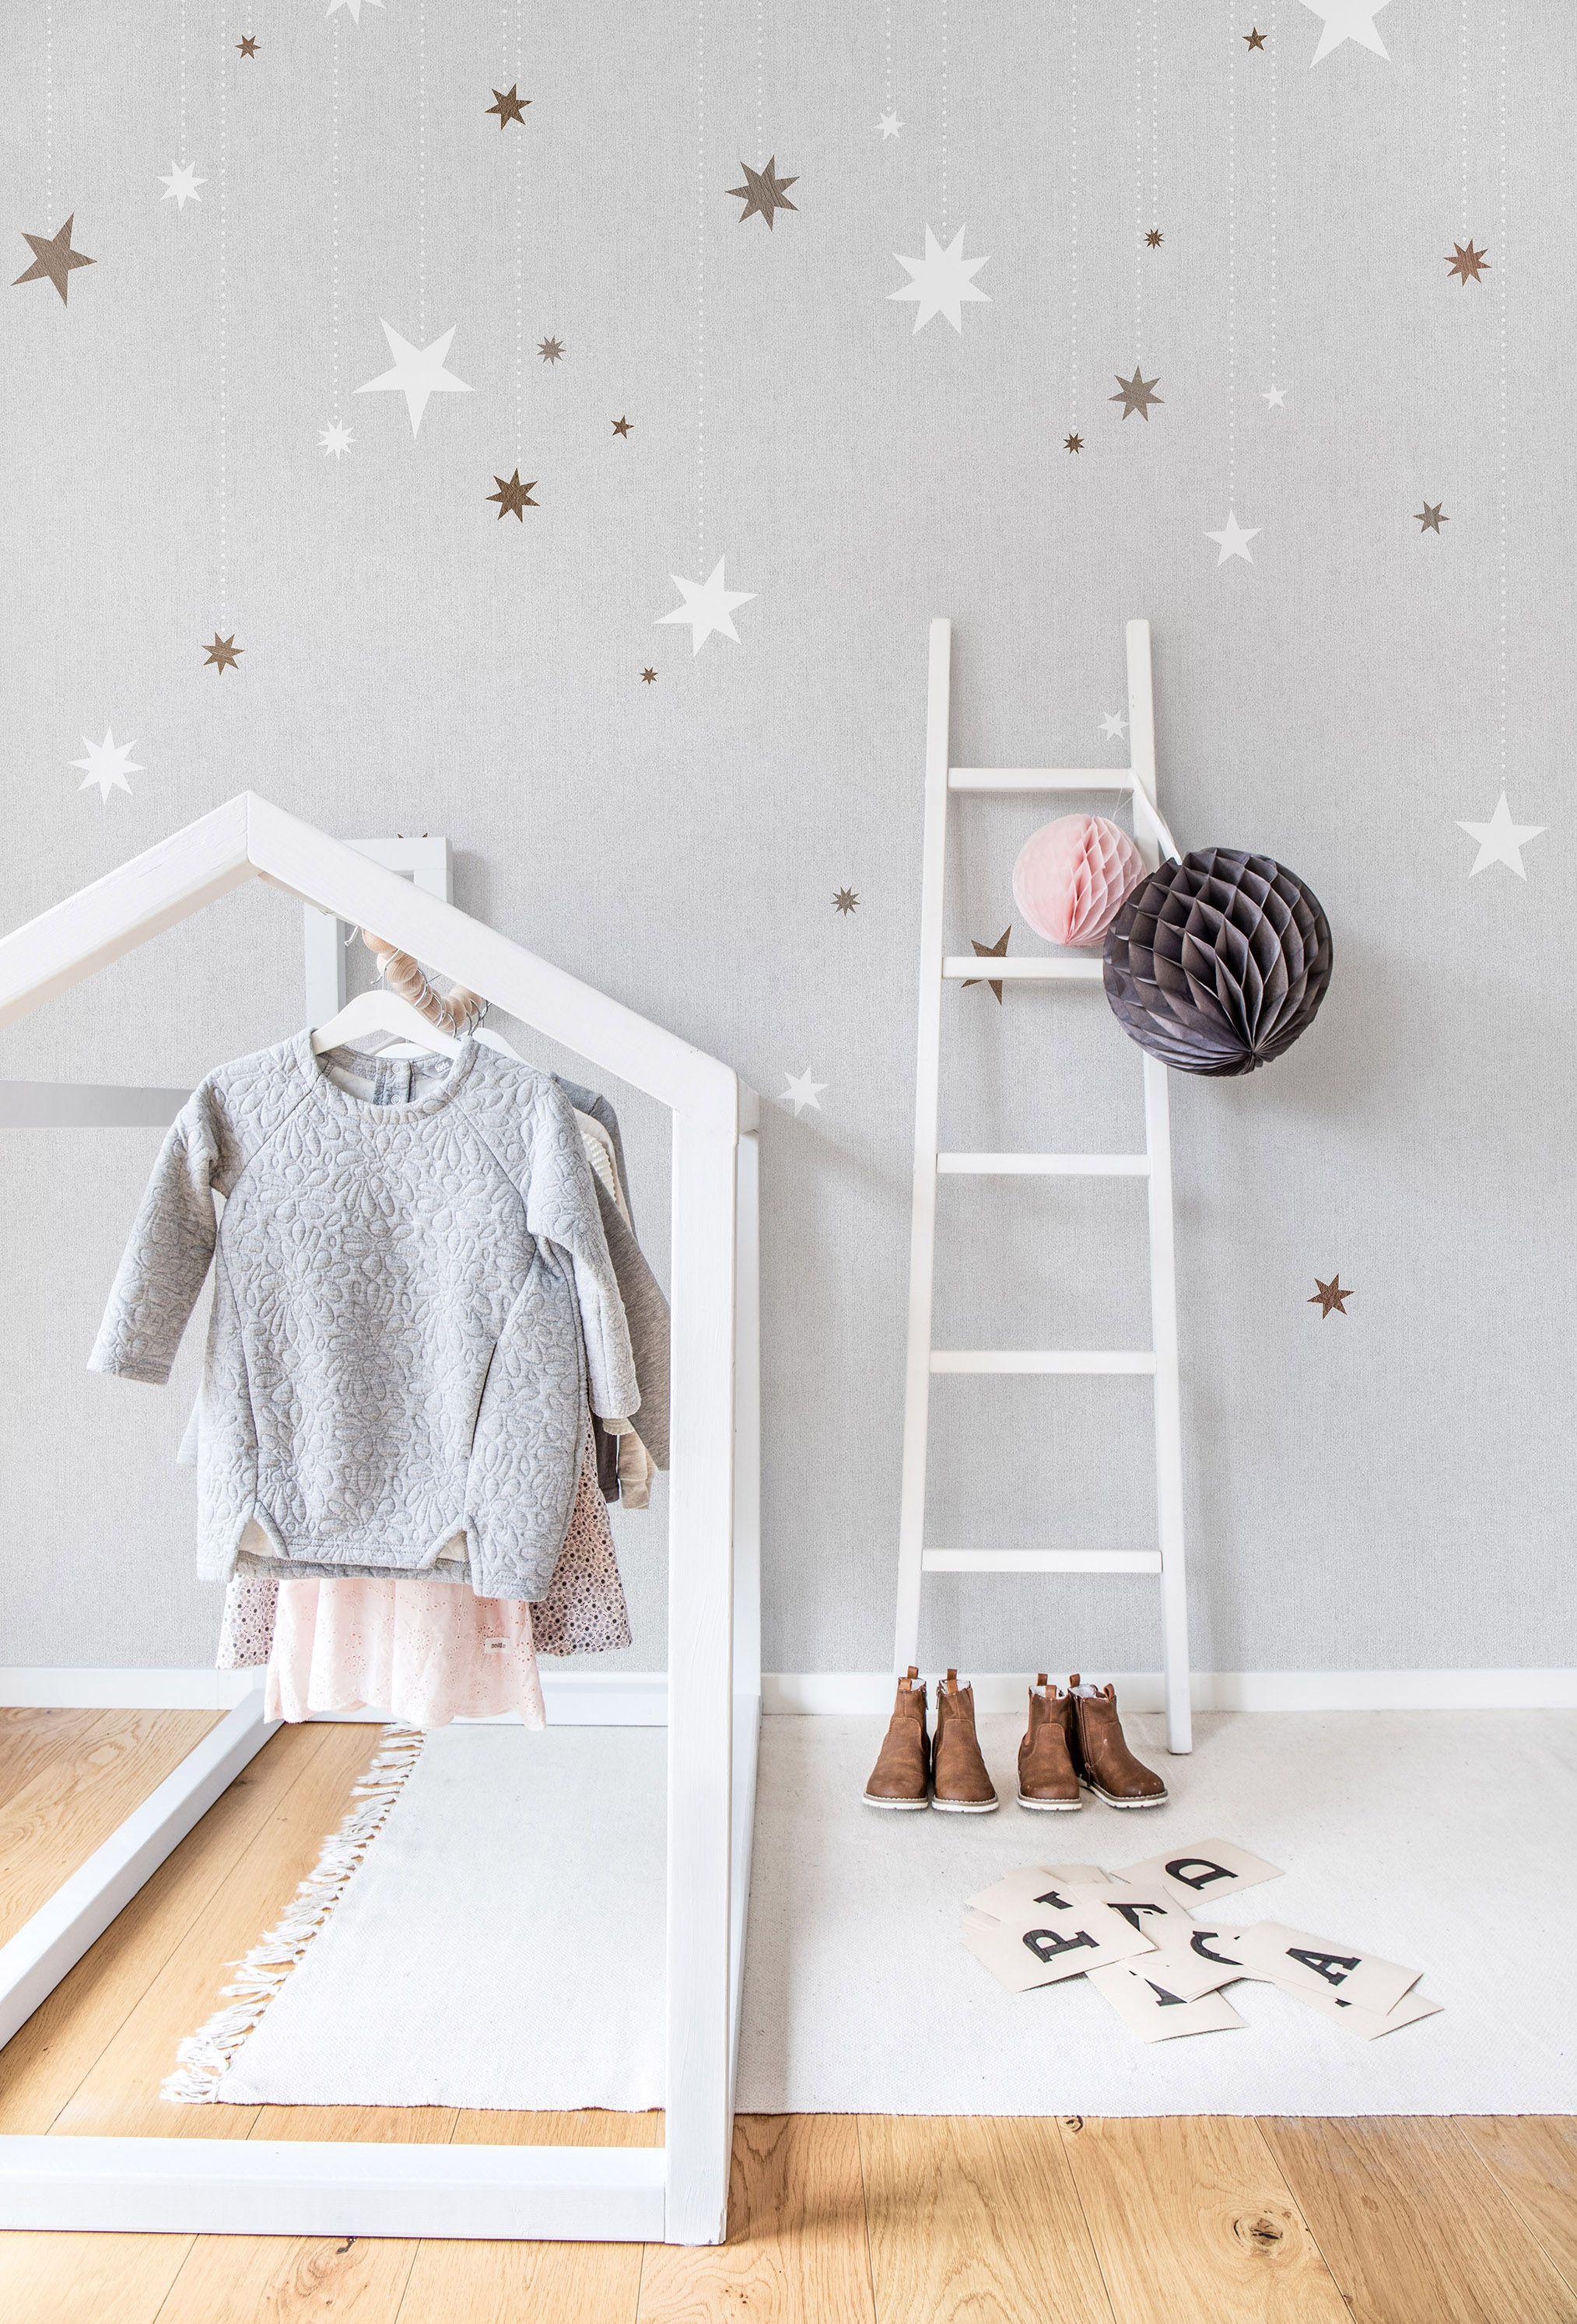 Hervorragend Tapete | Fototapete | Moderne Tapete | Mural Tapete | Wandgestaltung |  Wandverkleidung | Tapete Kinderzimmer